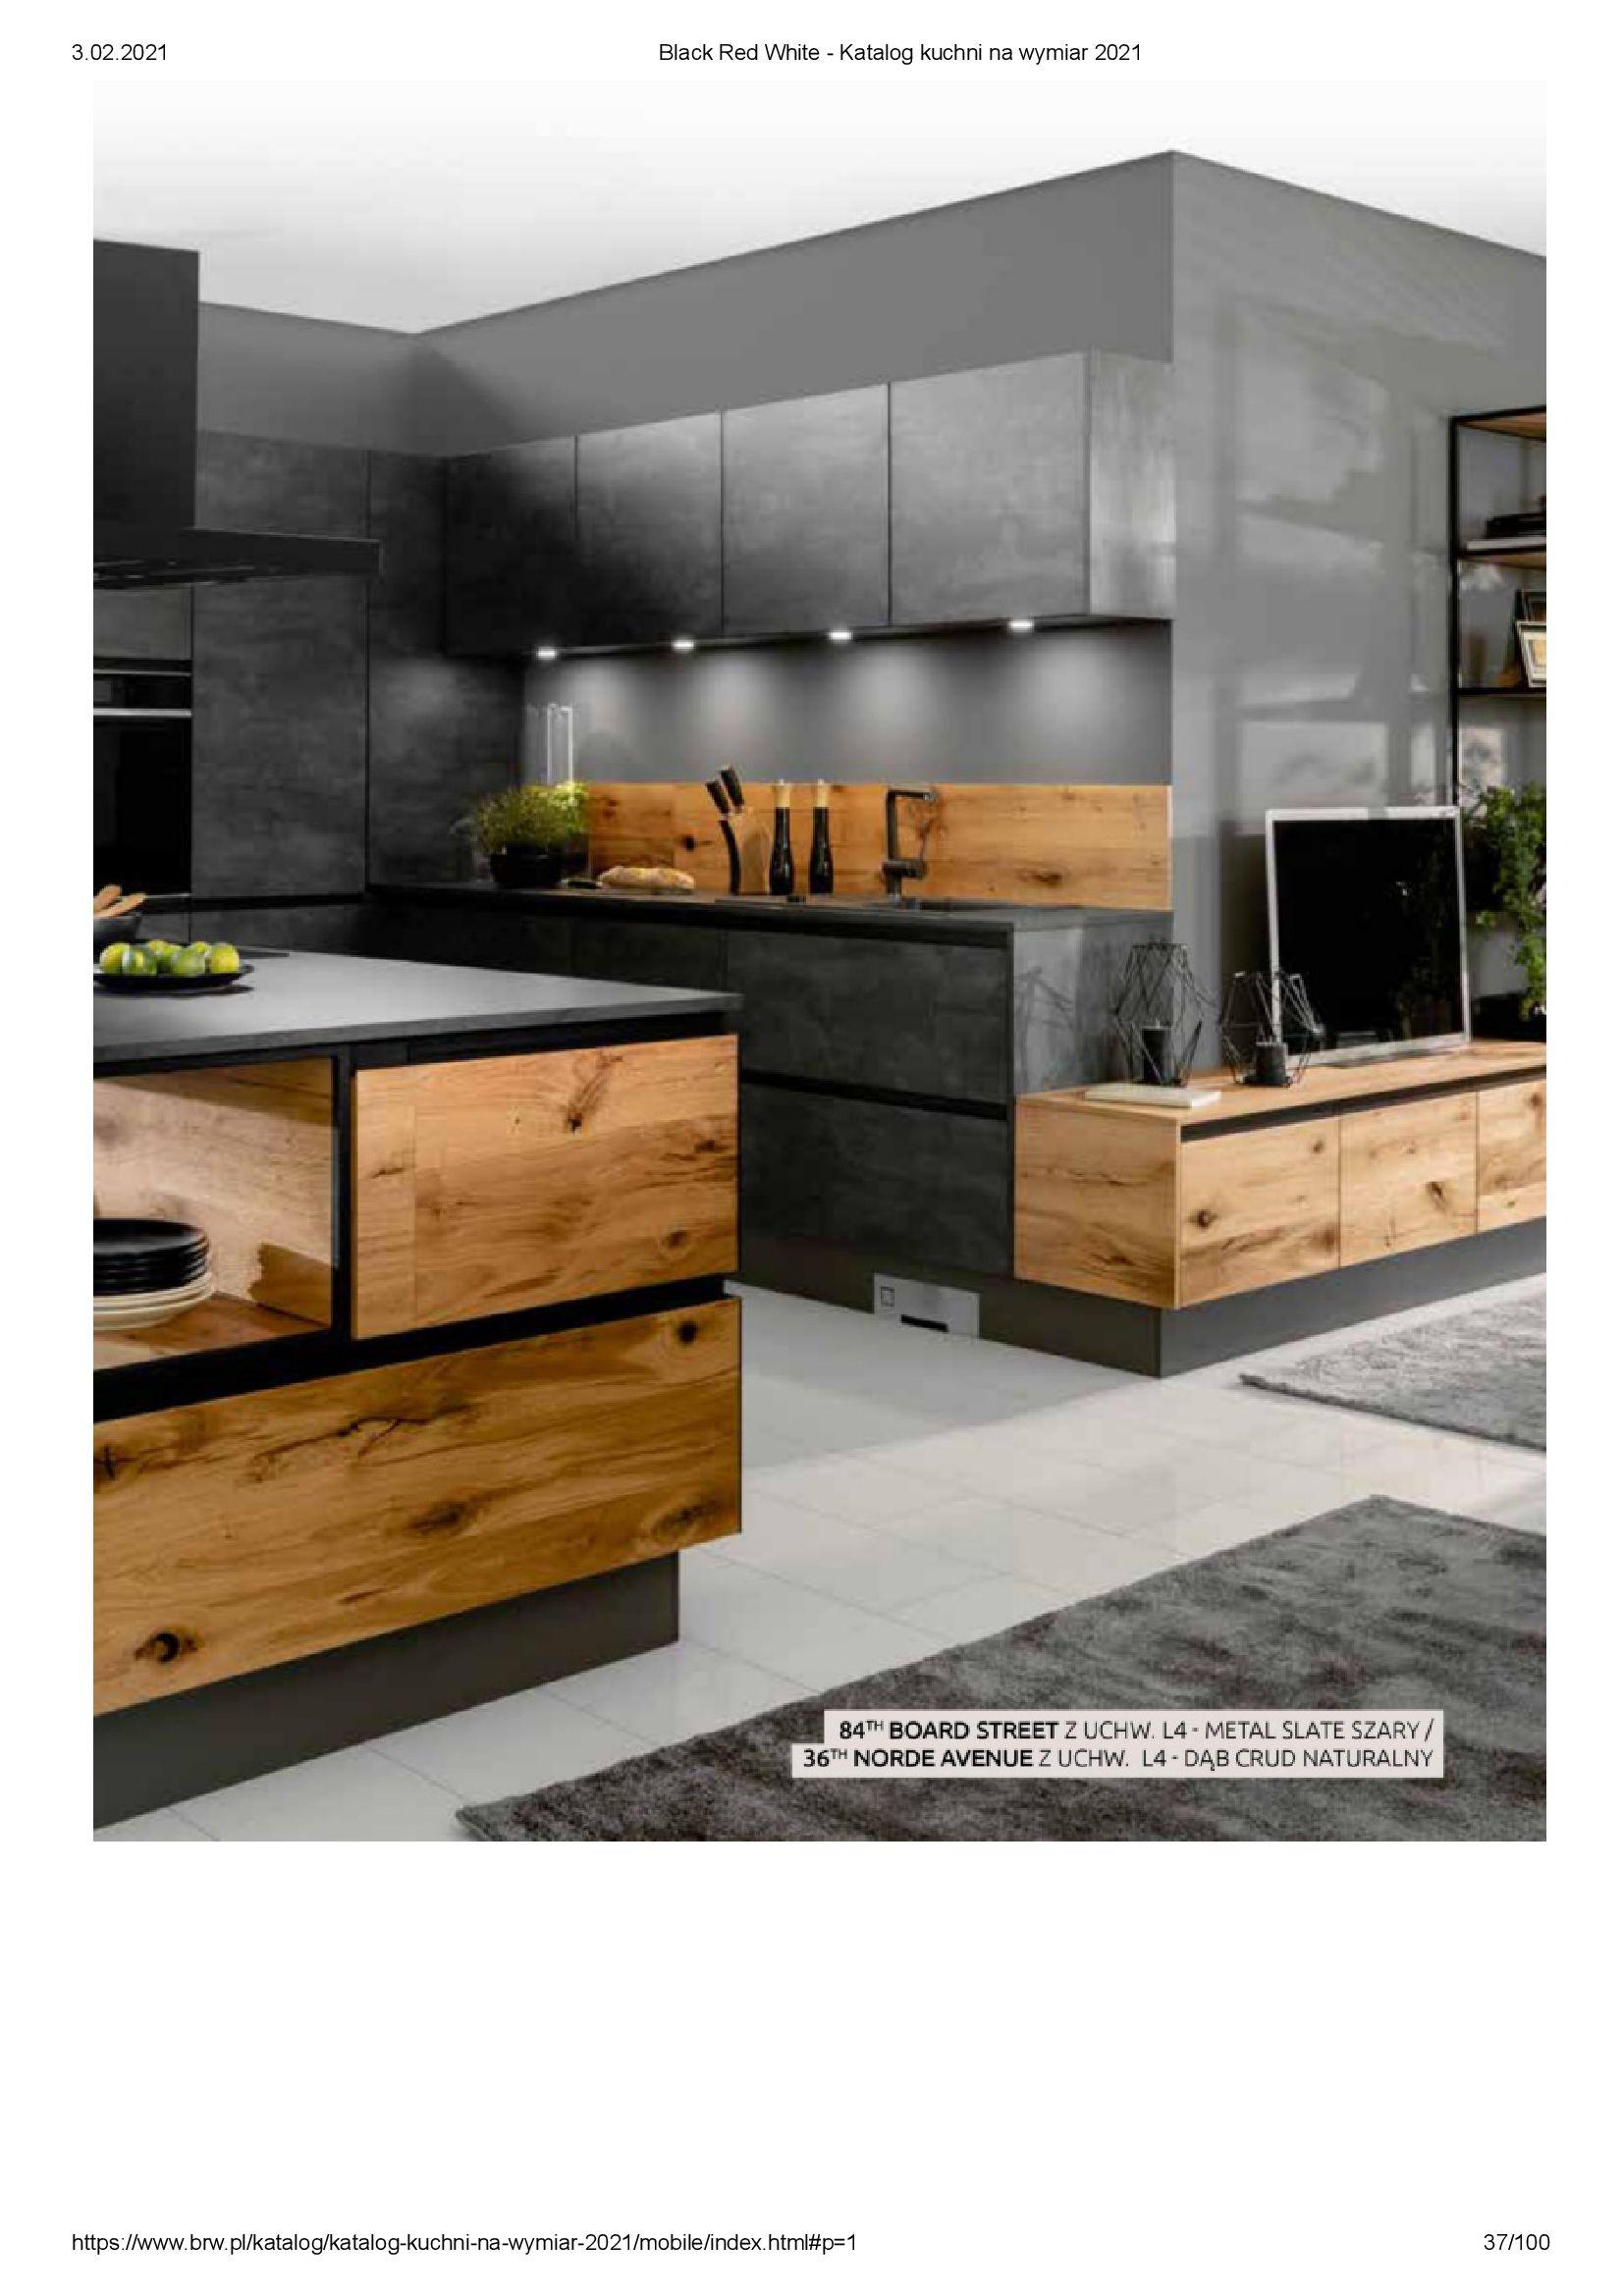 Gazetka Black Red White: Katalog - Kuchnie na wymiar Senso Kitchens 2021 2021-01-01 page-37